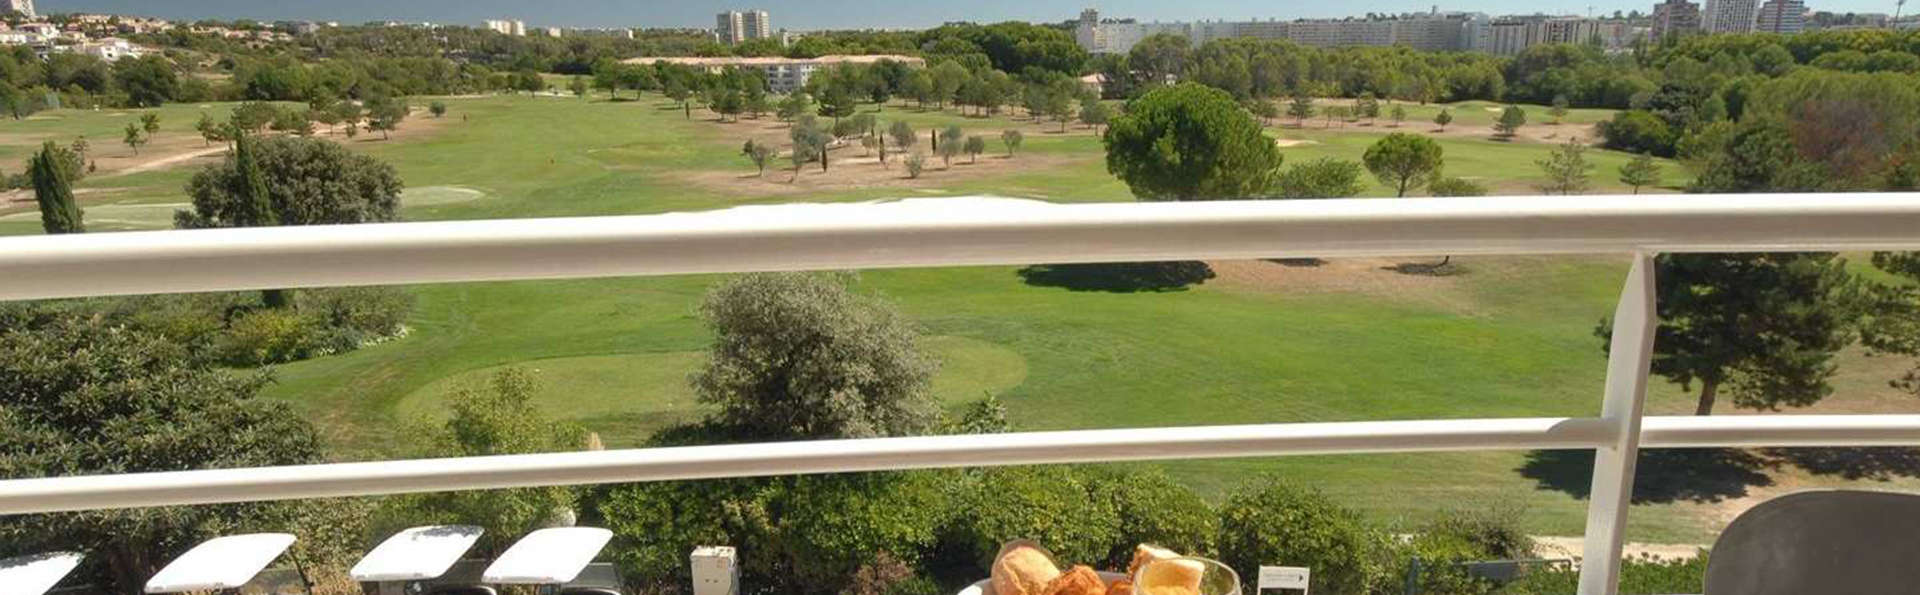 Week-end initiation golf à Montpellier